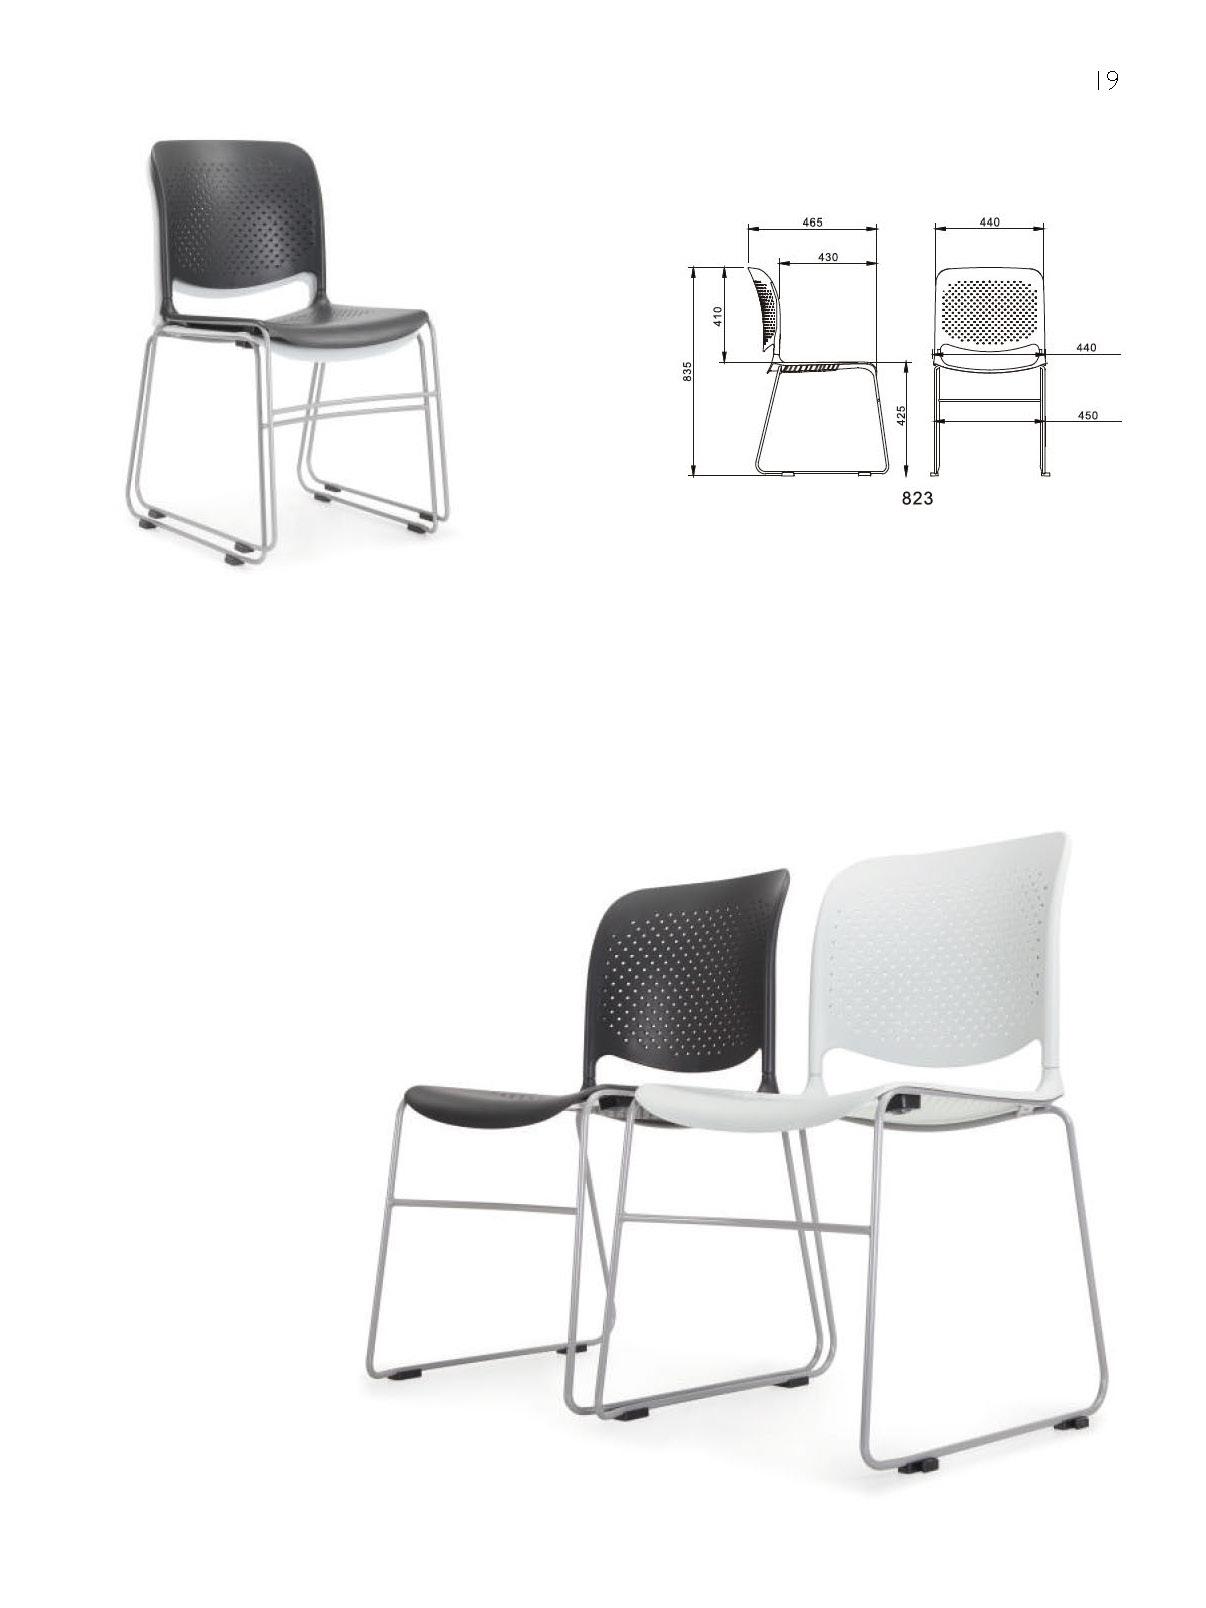 Top Furniture Catalog 2019_Page_19.jpg